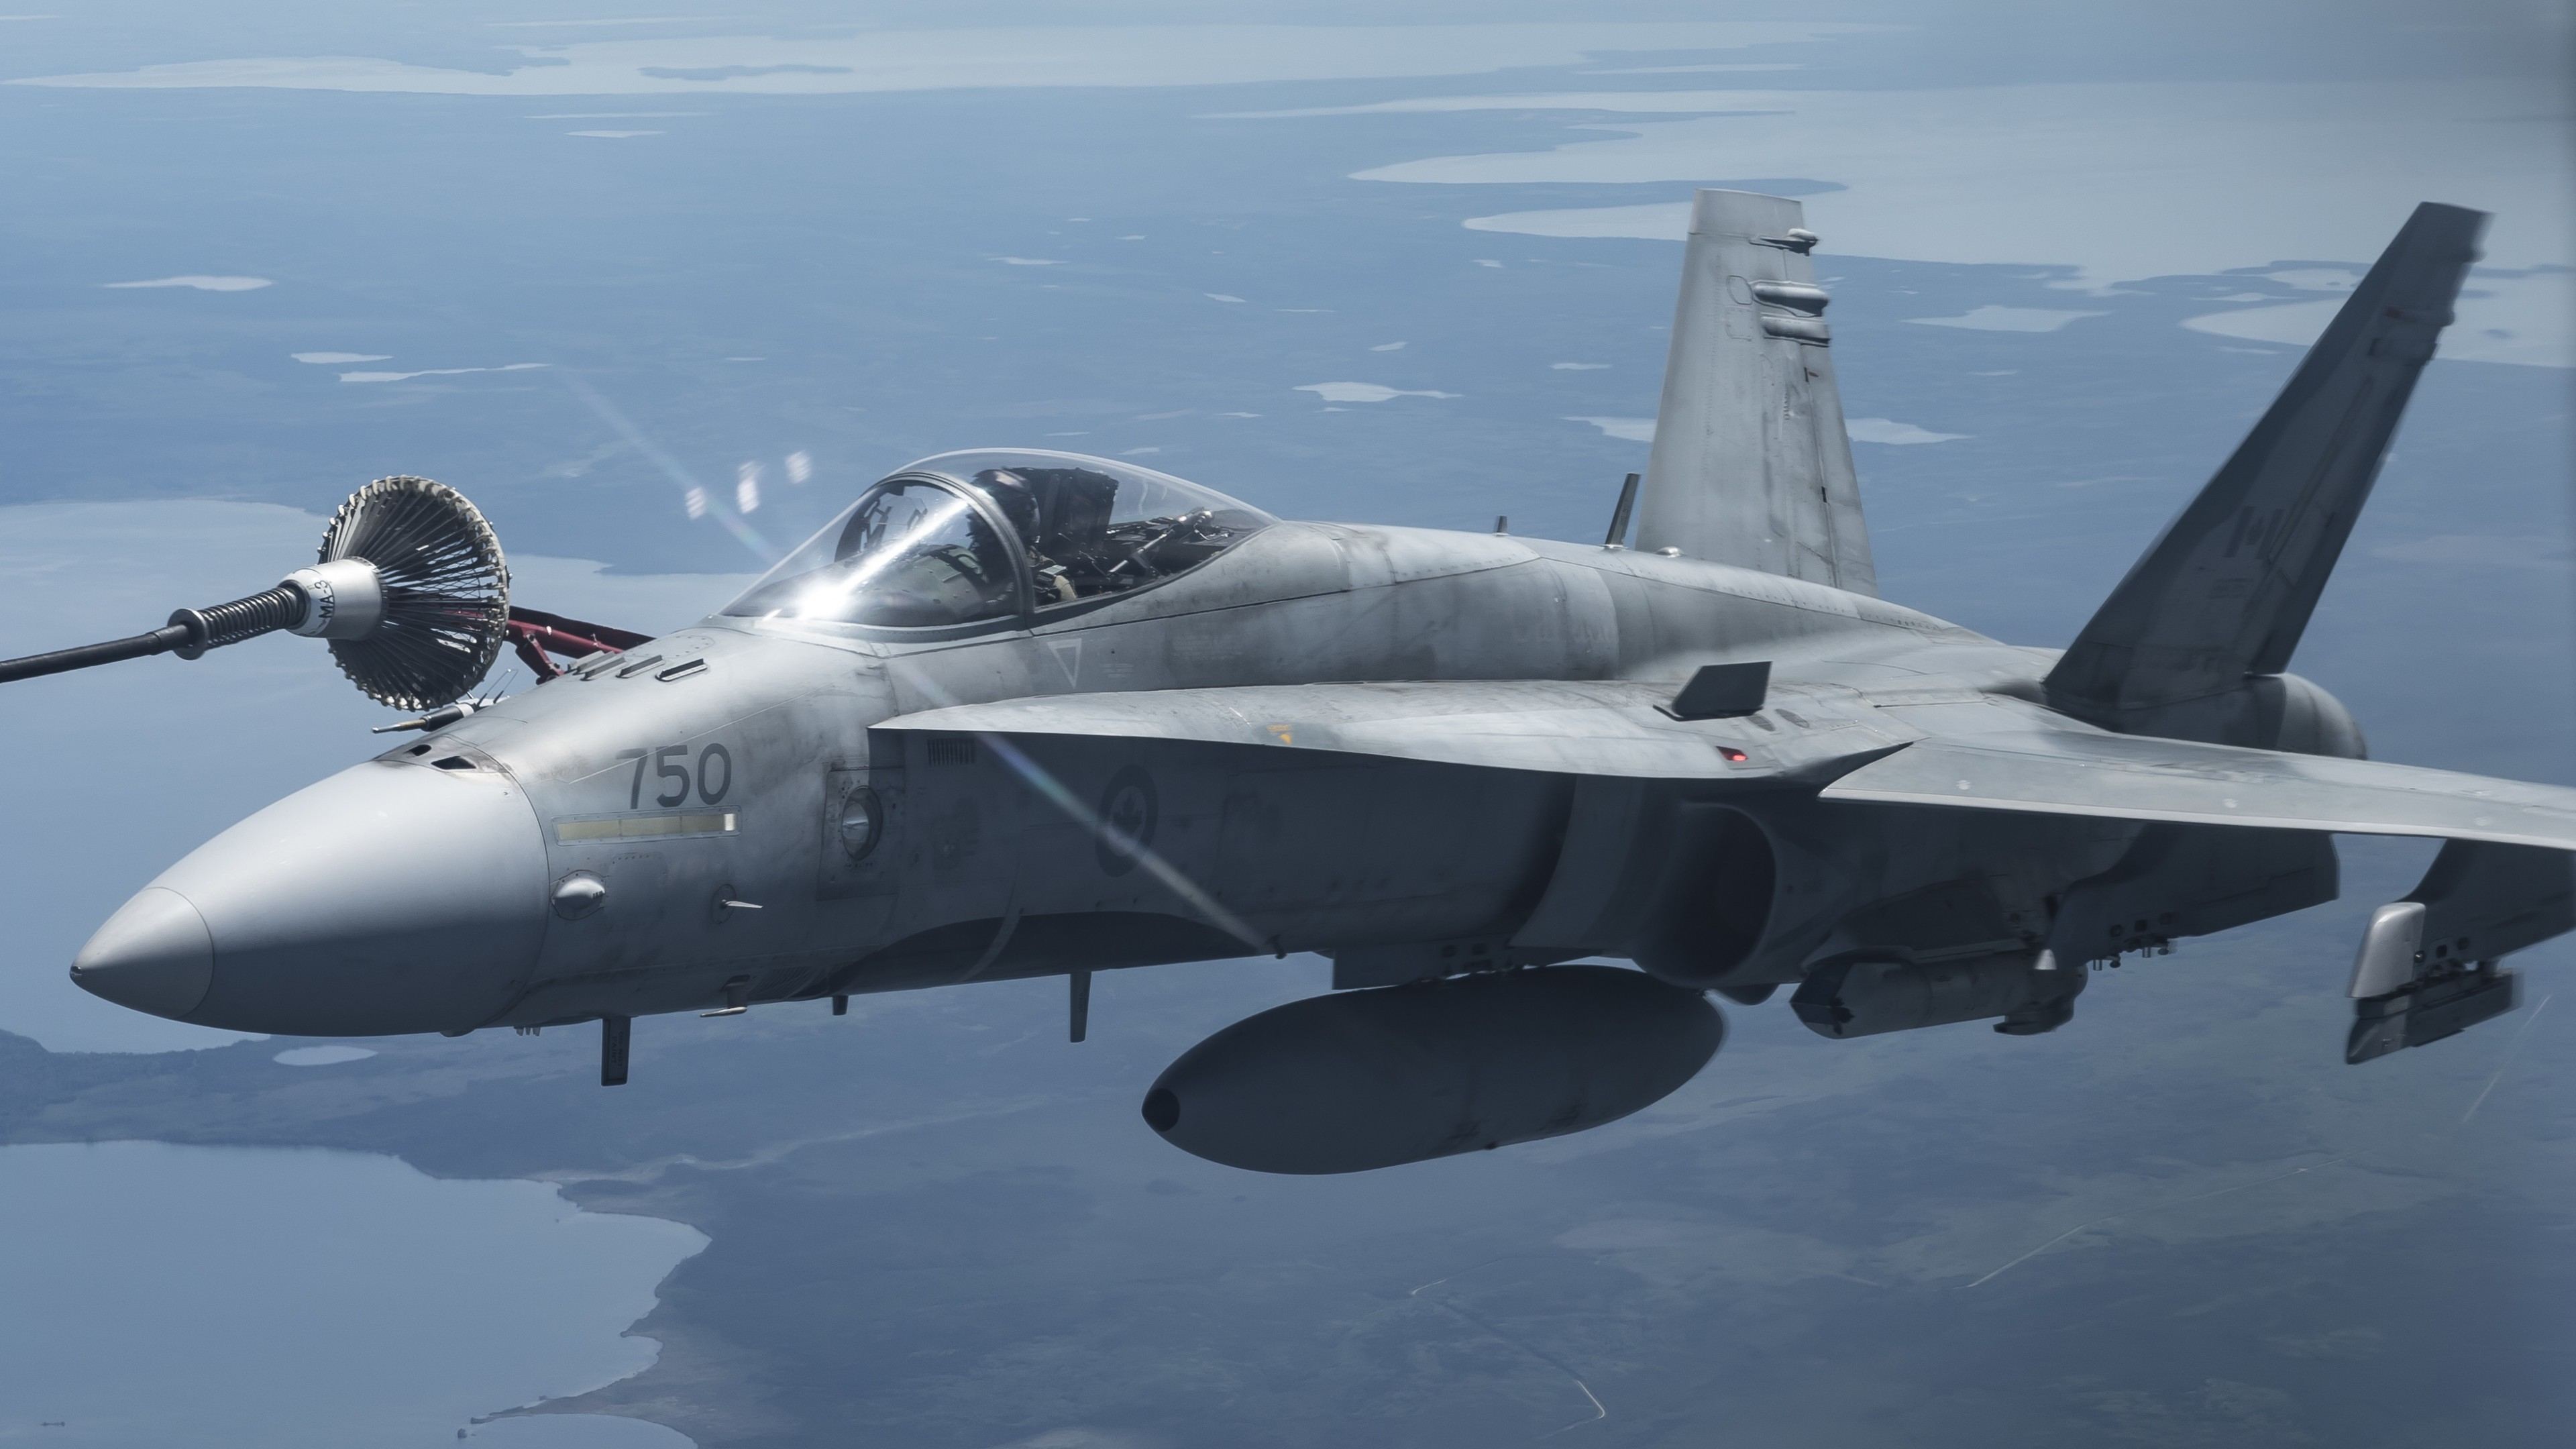 McDonnell Douglas F/A-18 Hornet, Fighter jet, Supersonic jet, United